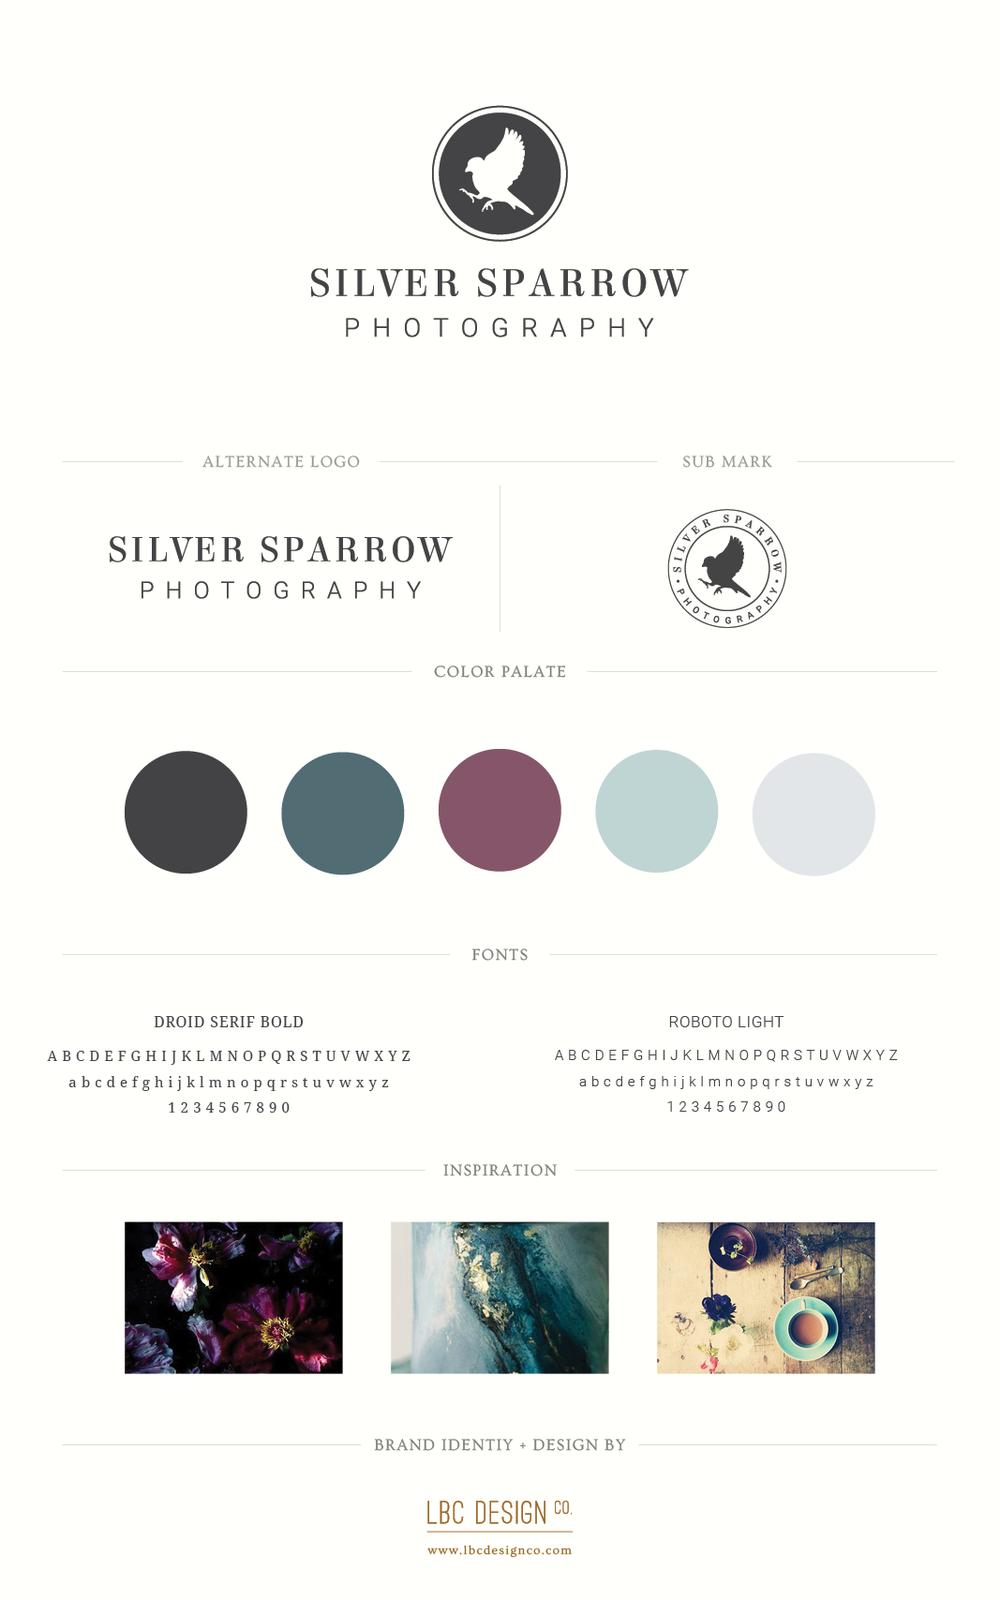 Silver Sparrow Photo-Brand Board